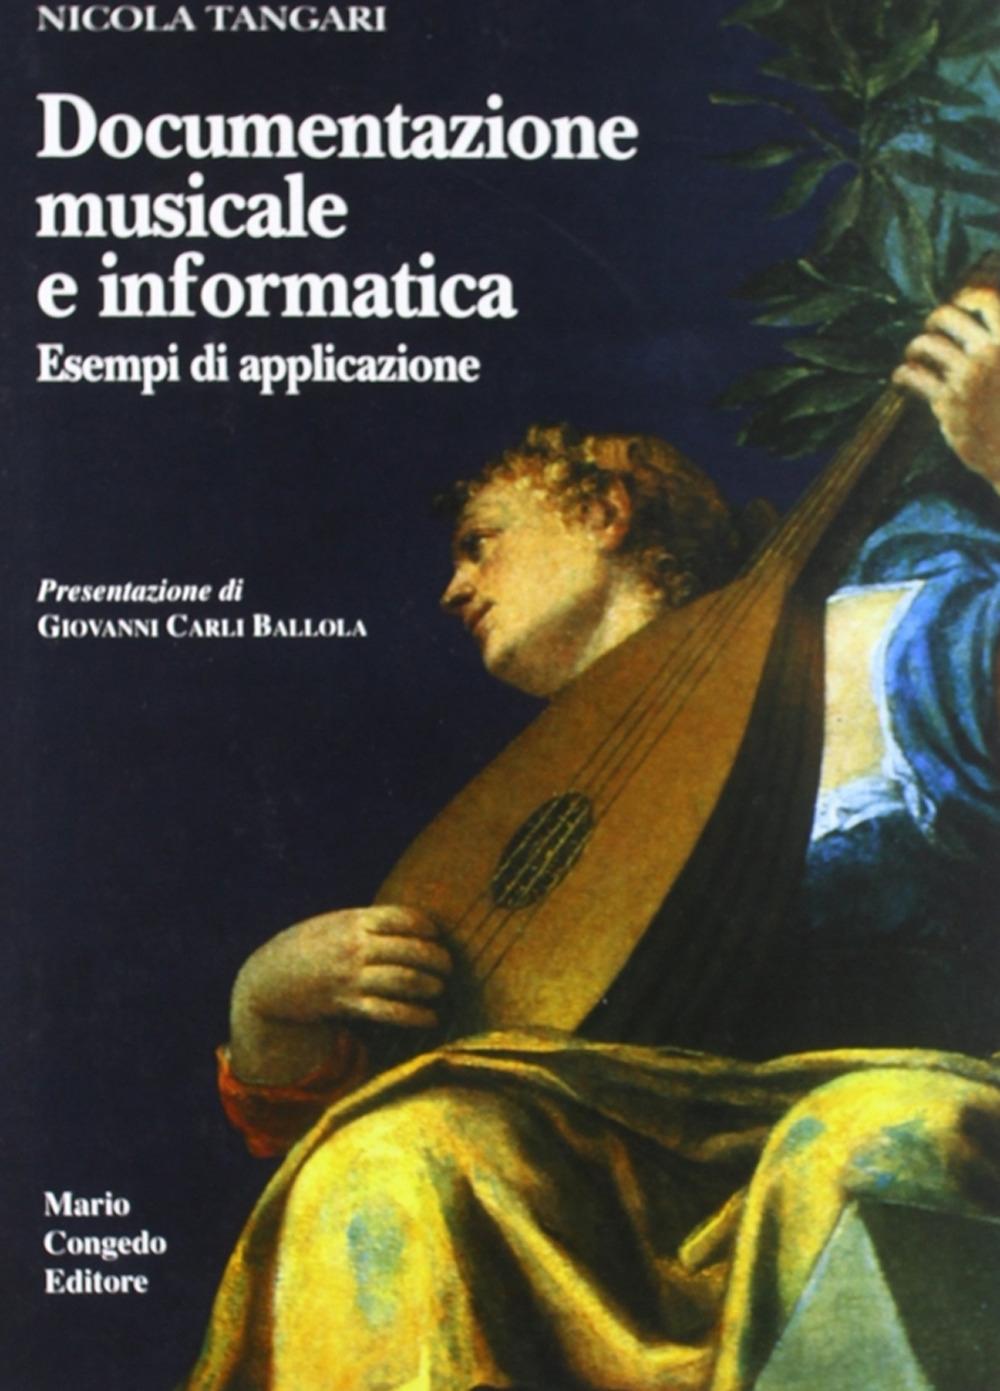 Documentazione musicale e informatica. Esempi di applicazione